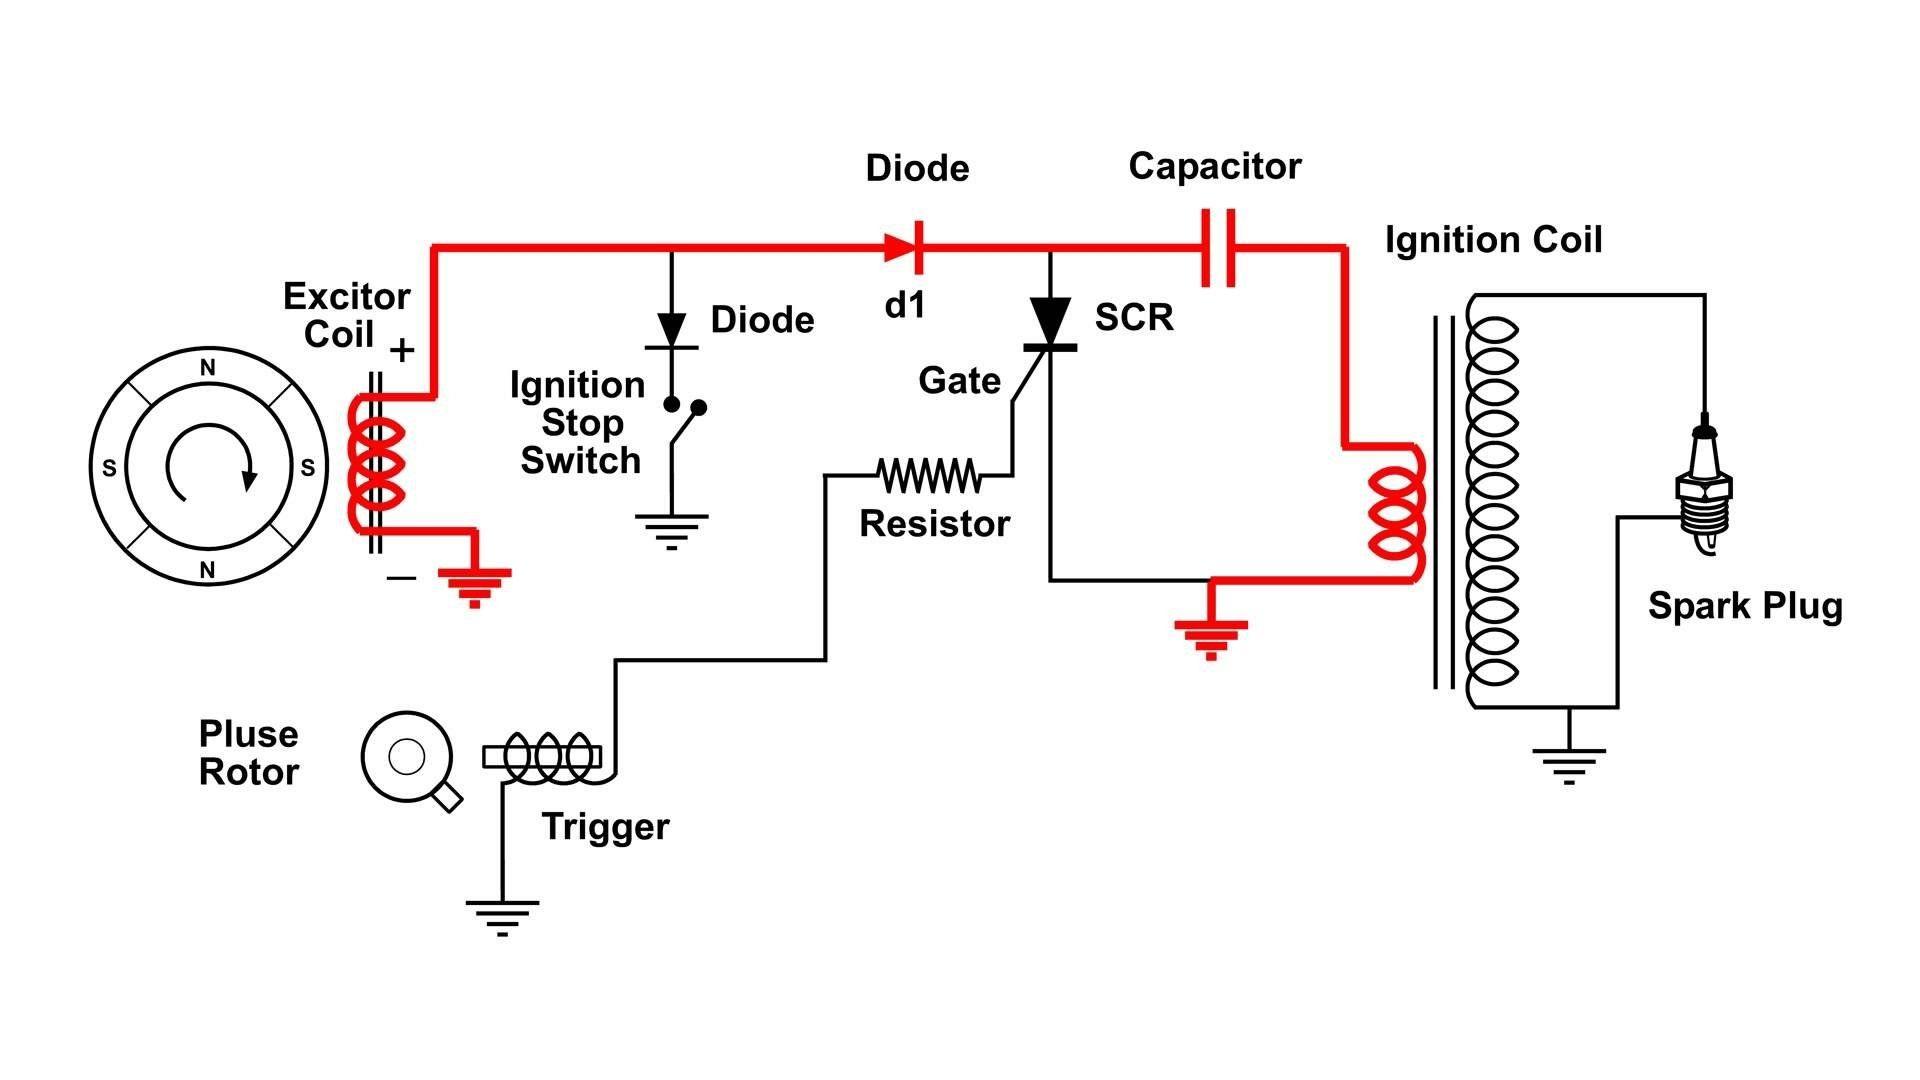 CF_6780] Chainsaw Coil Wiring Diagram Wiring DiagramLing Props Chim Cular Puti Onica Gue45 Sapebe Mohammedshrine Librar Wiring  101